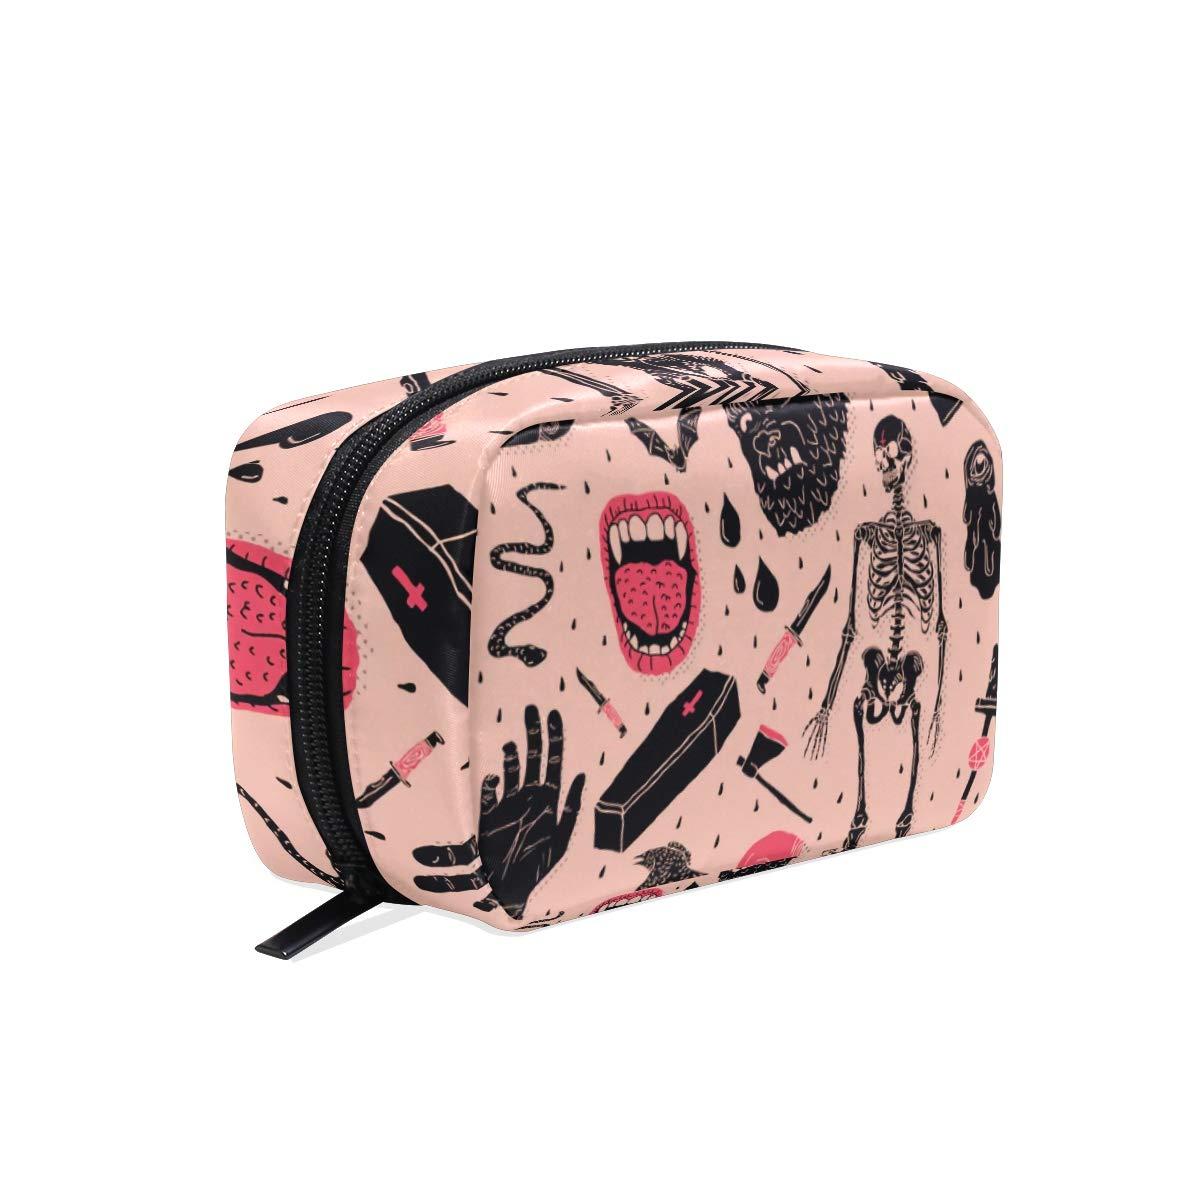 Cosmetic Makeup Bag Pouch Halloween Horror Skull Clutch